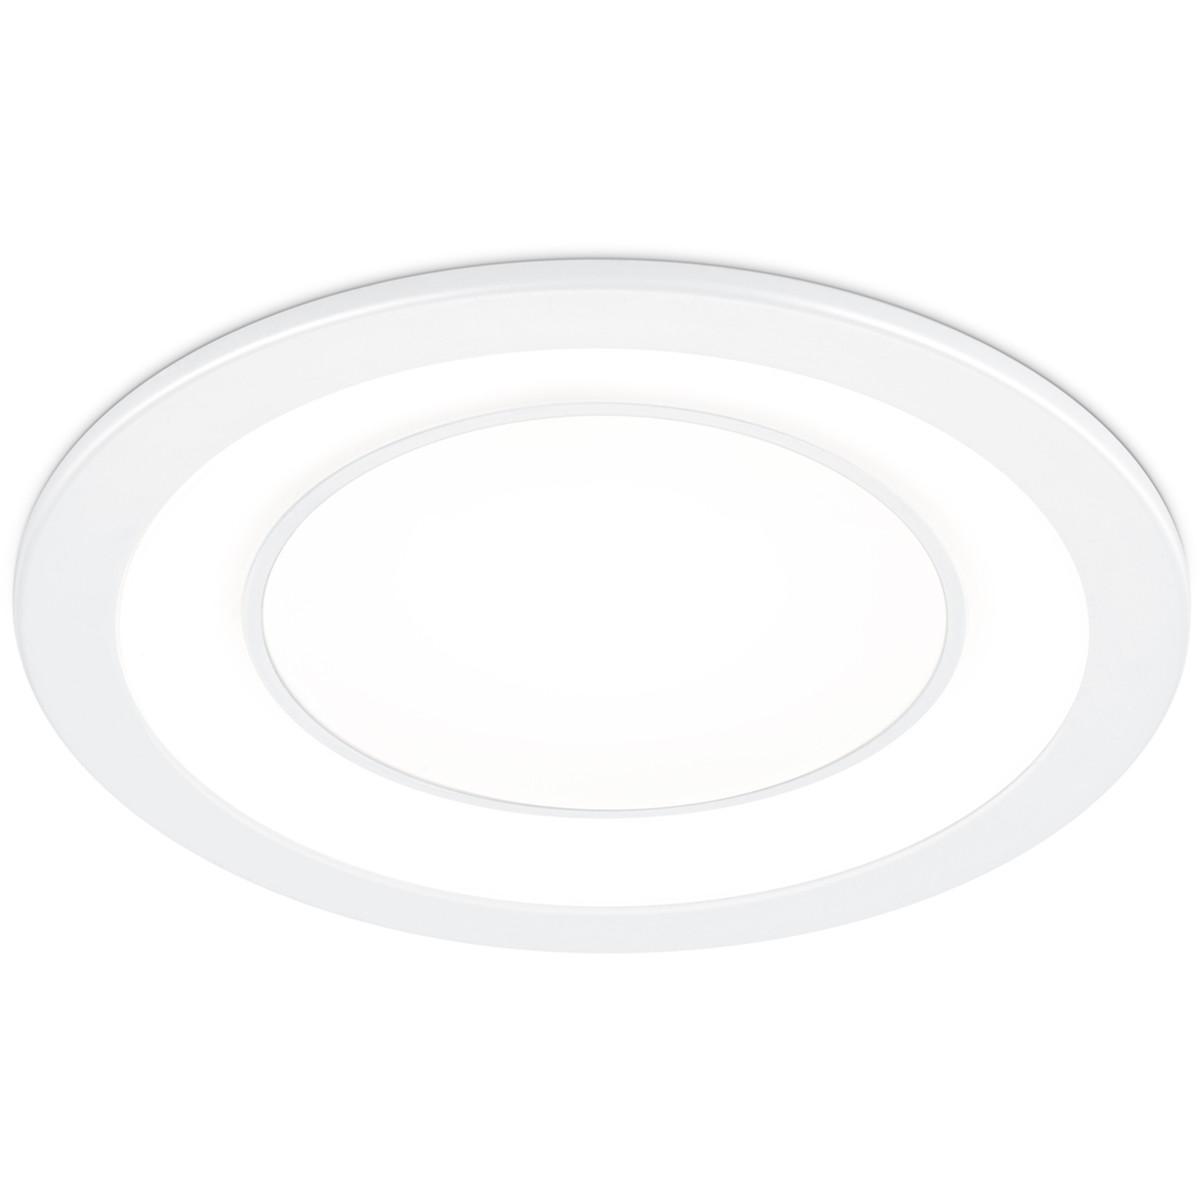 LED Spot - Inbouwspot - Trion Cynomi - 10W - Warm Wit 3000K - Rond - Mat Wit - Kunststof - Ø140mm